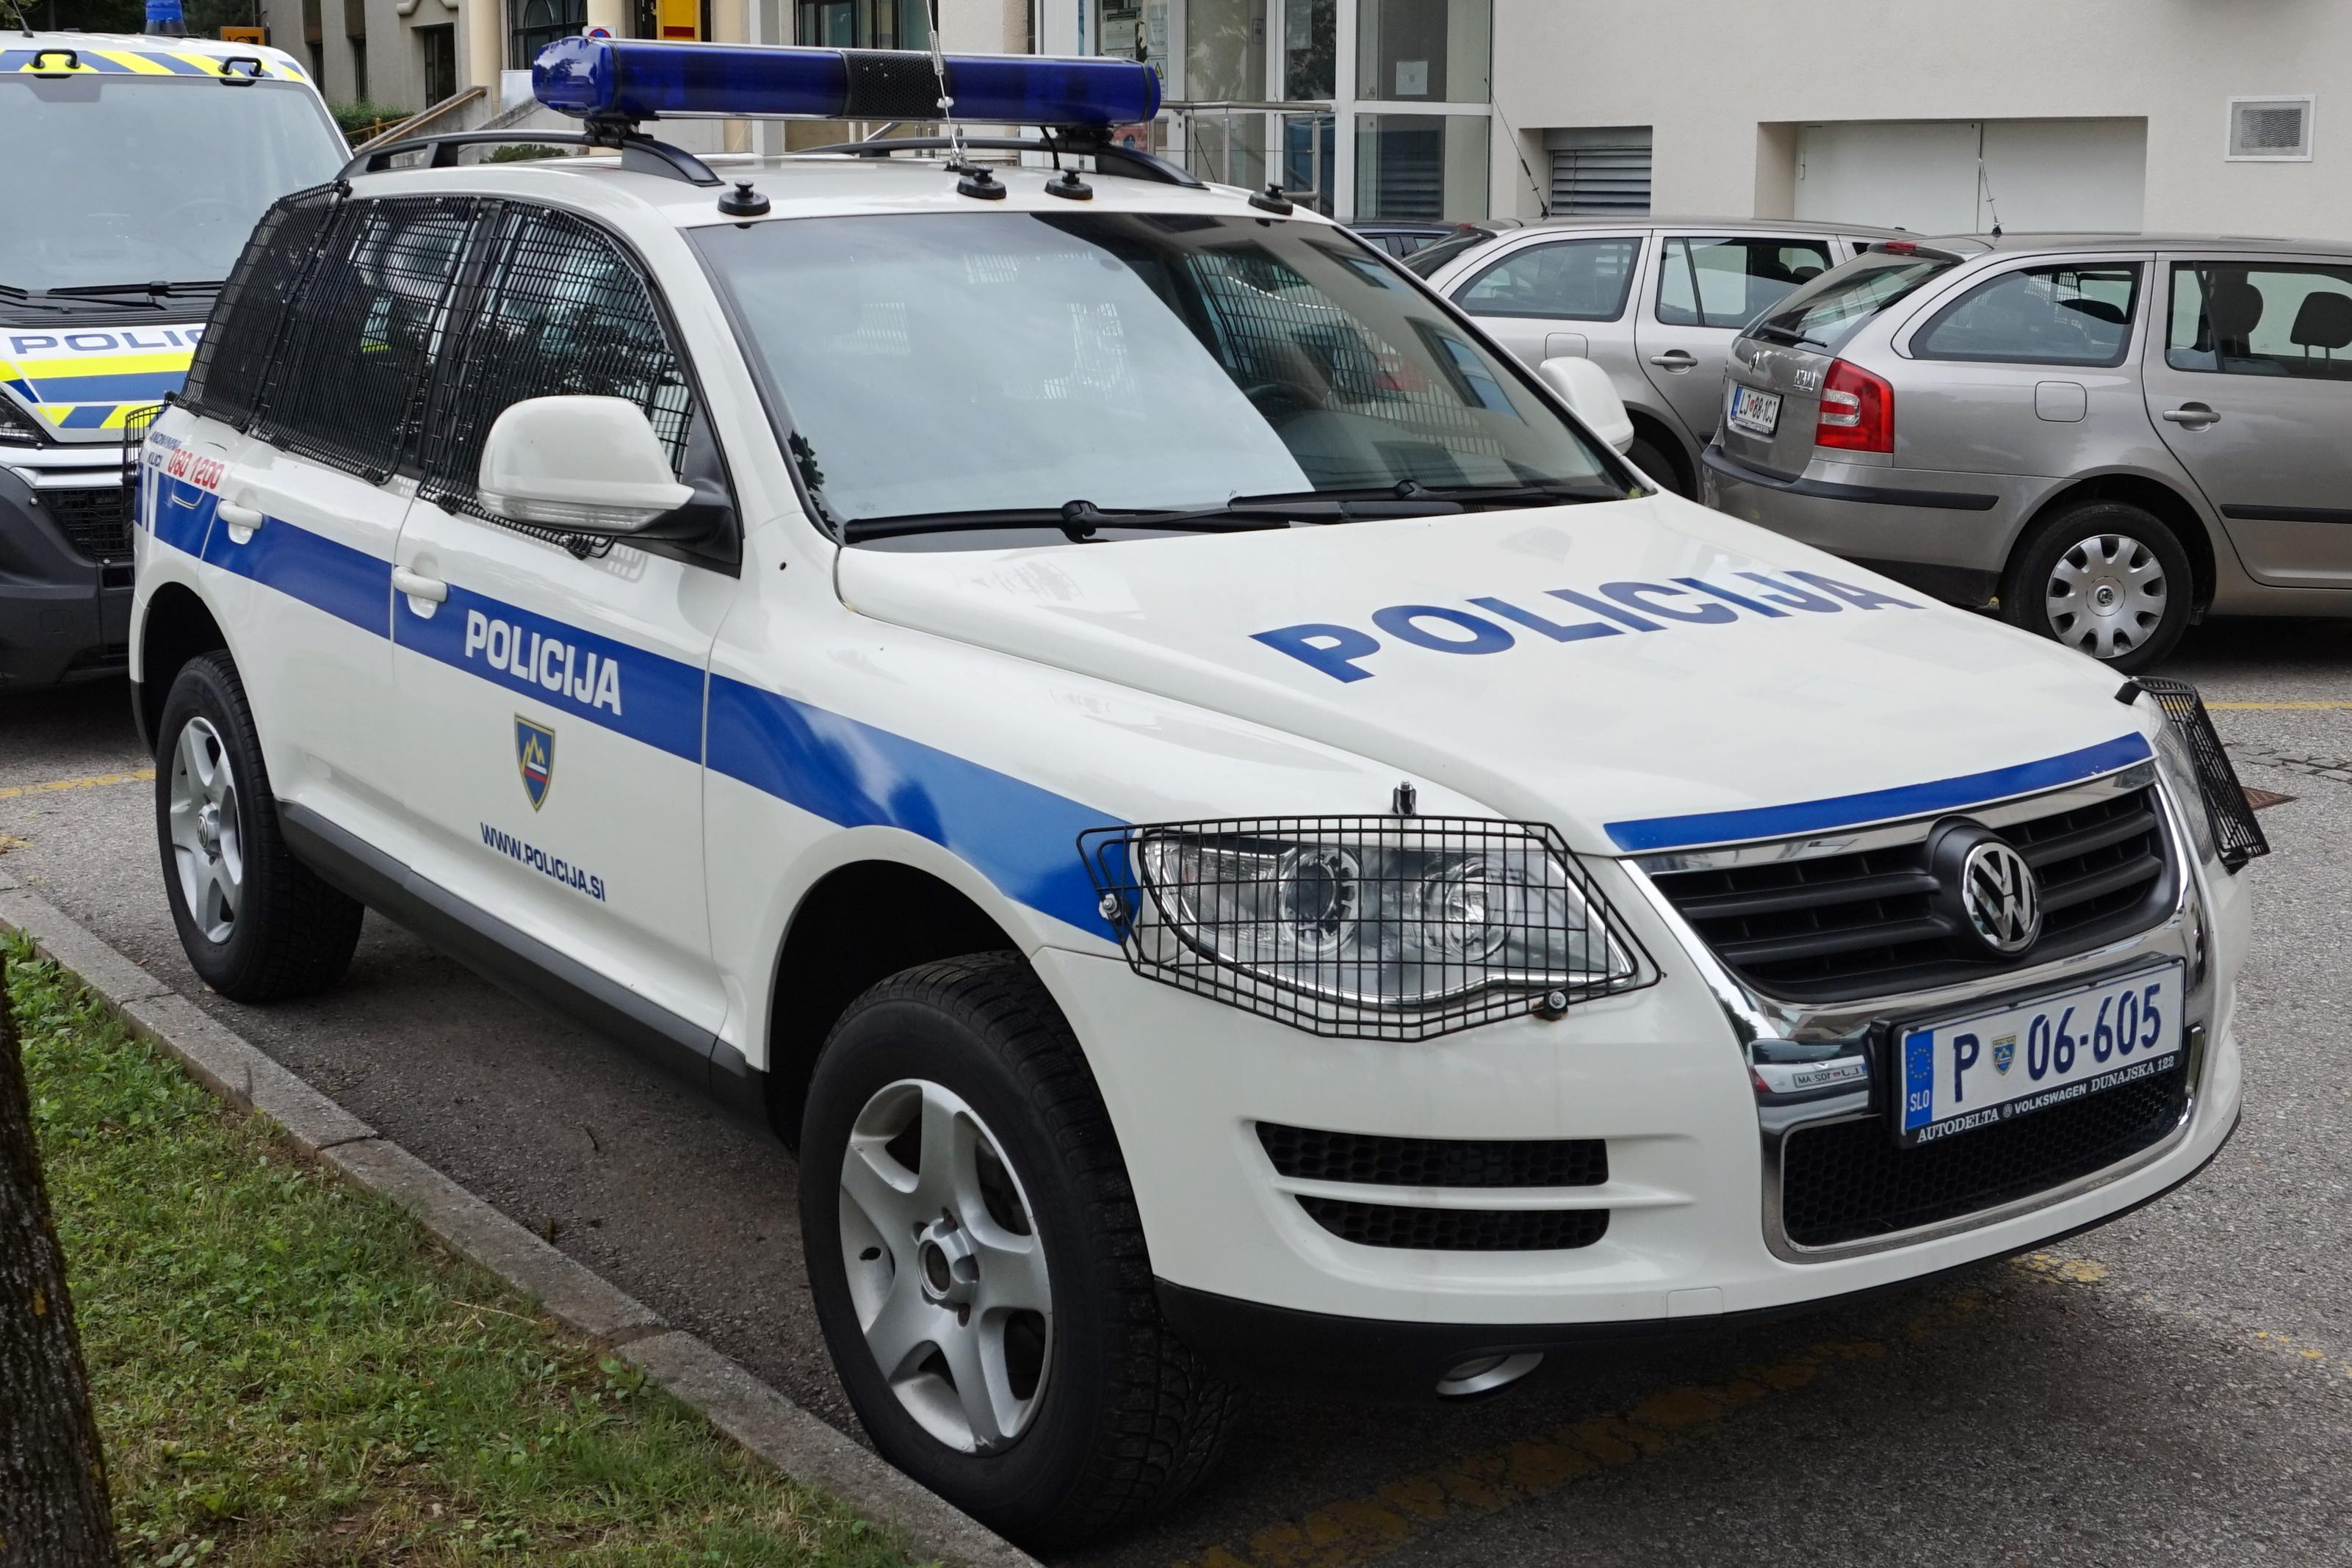 file police car in slovenia vw jpg wikimedia commons rh commons wikimedia org